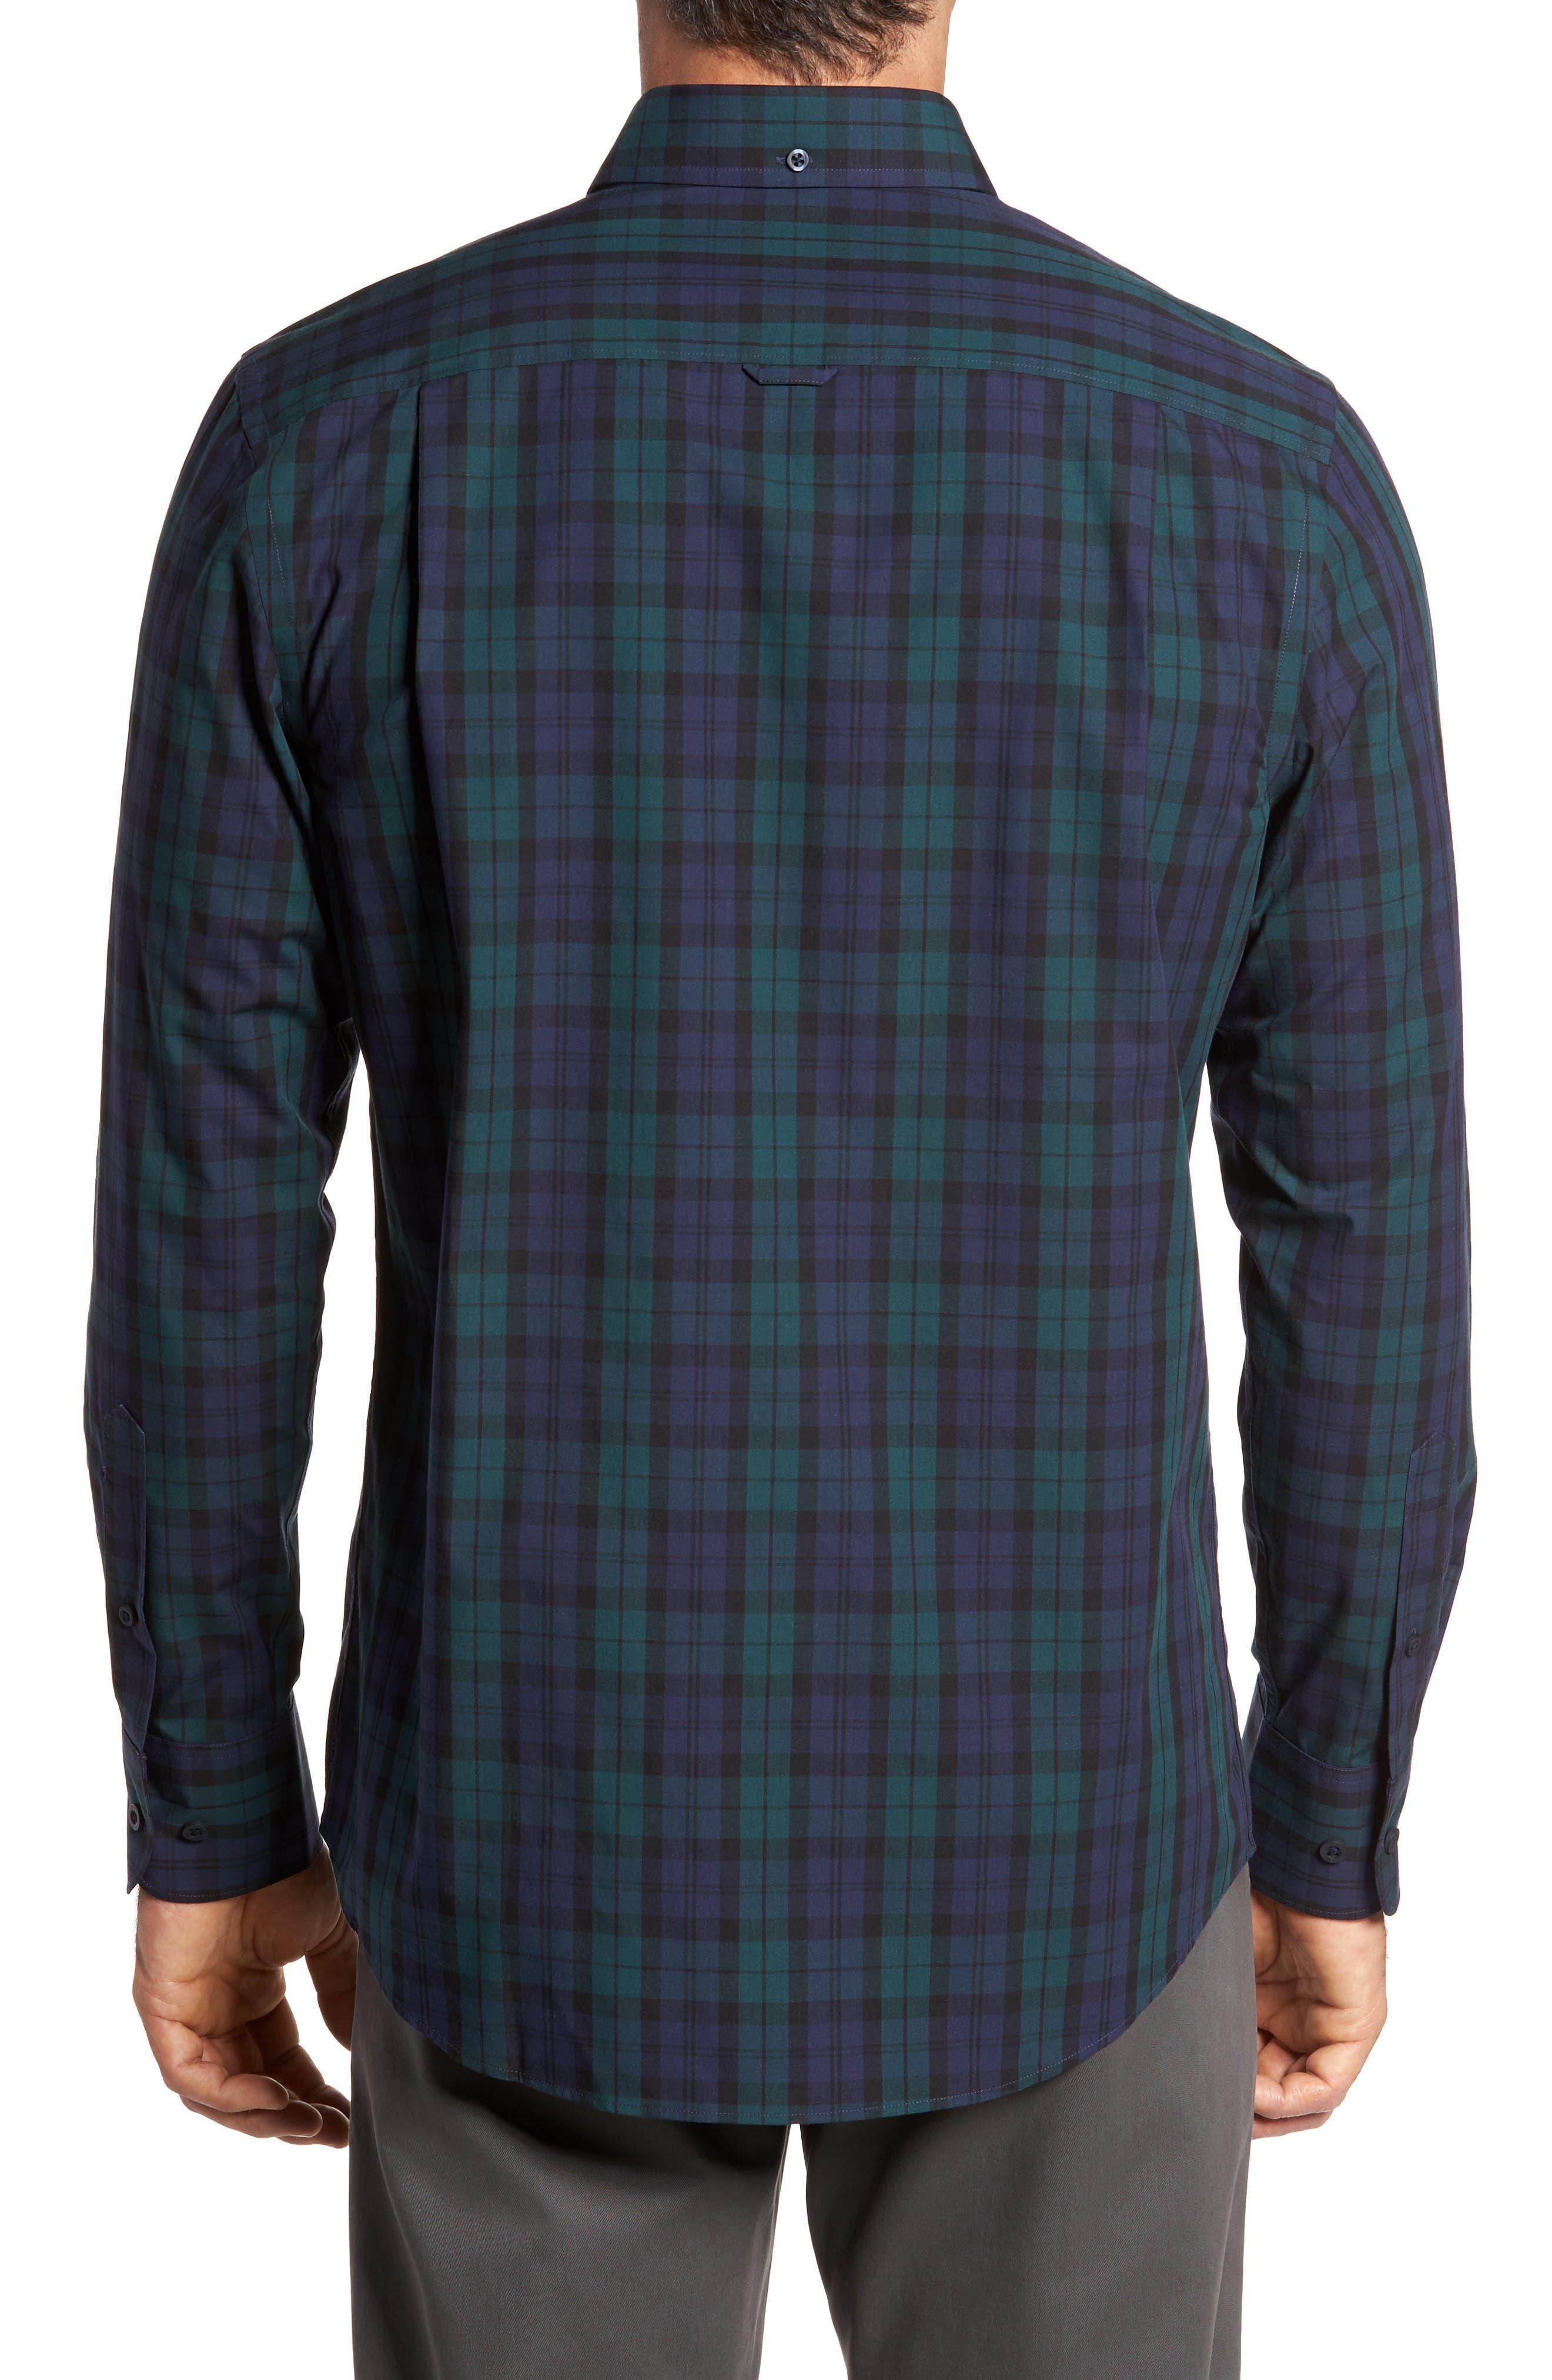 Regular Fit Non-Iron Plaid Sport Shirt,                             Alternate thumbnail 2, color,                             Green Bug Navy Tartan